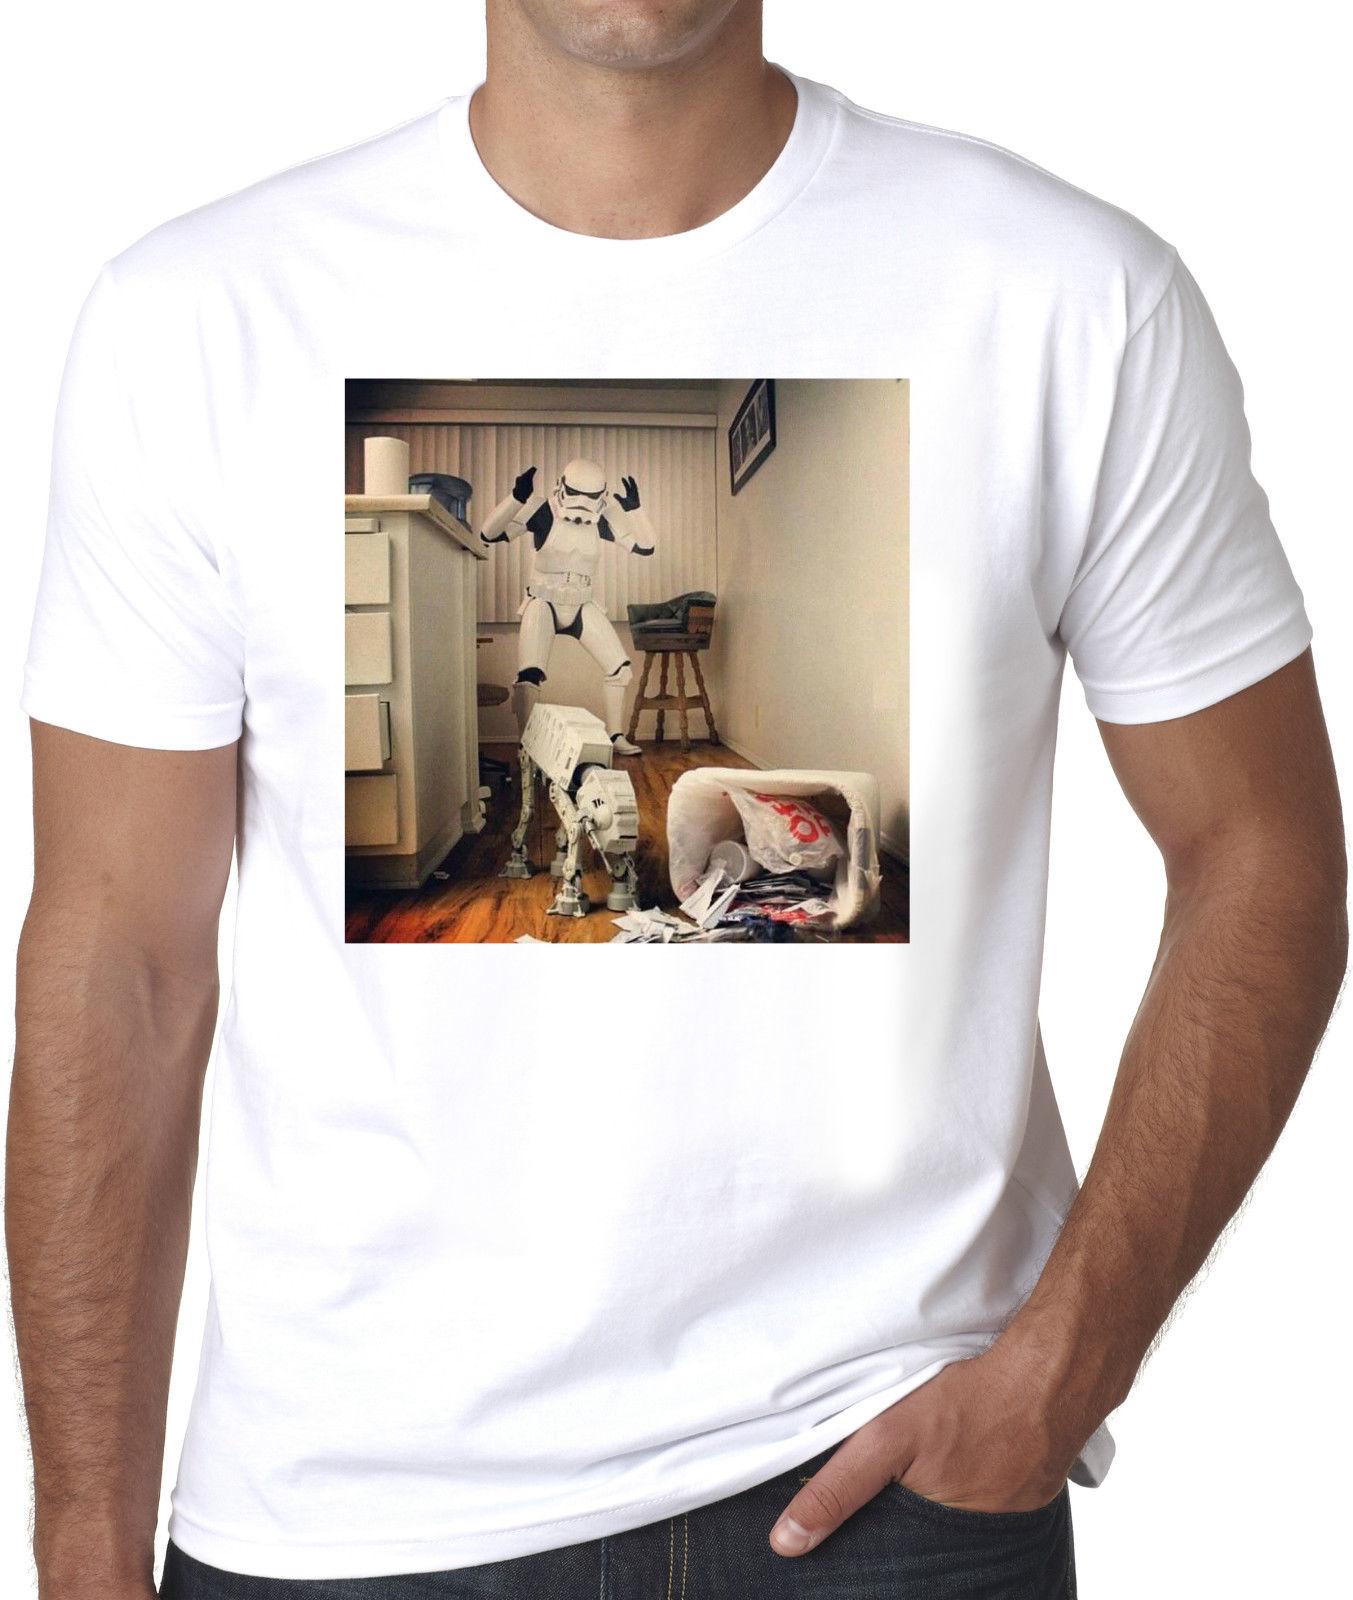 Naughty At-At in bin Stormtrooper sc-fi geek mens 100% Cotton T-shirt Cool Casual pride t shirt men Unisex New Fashion tshirt